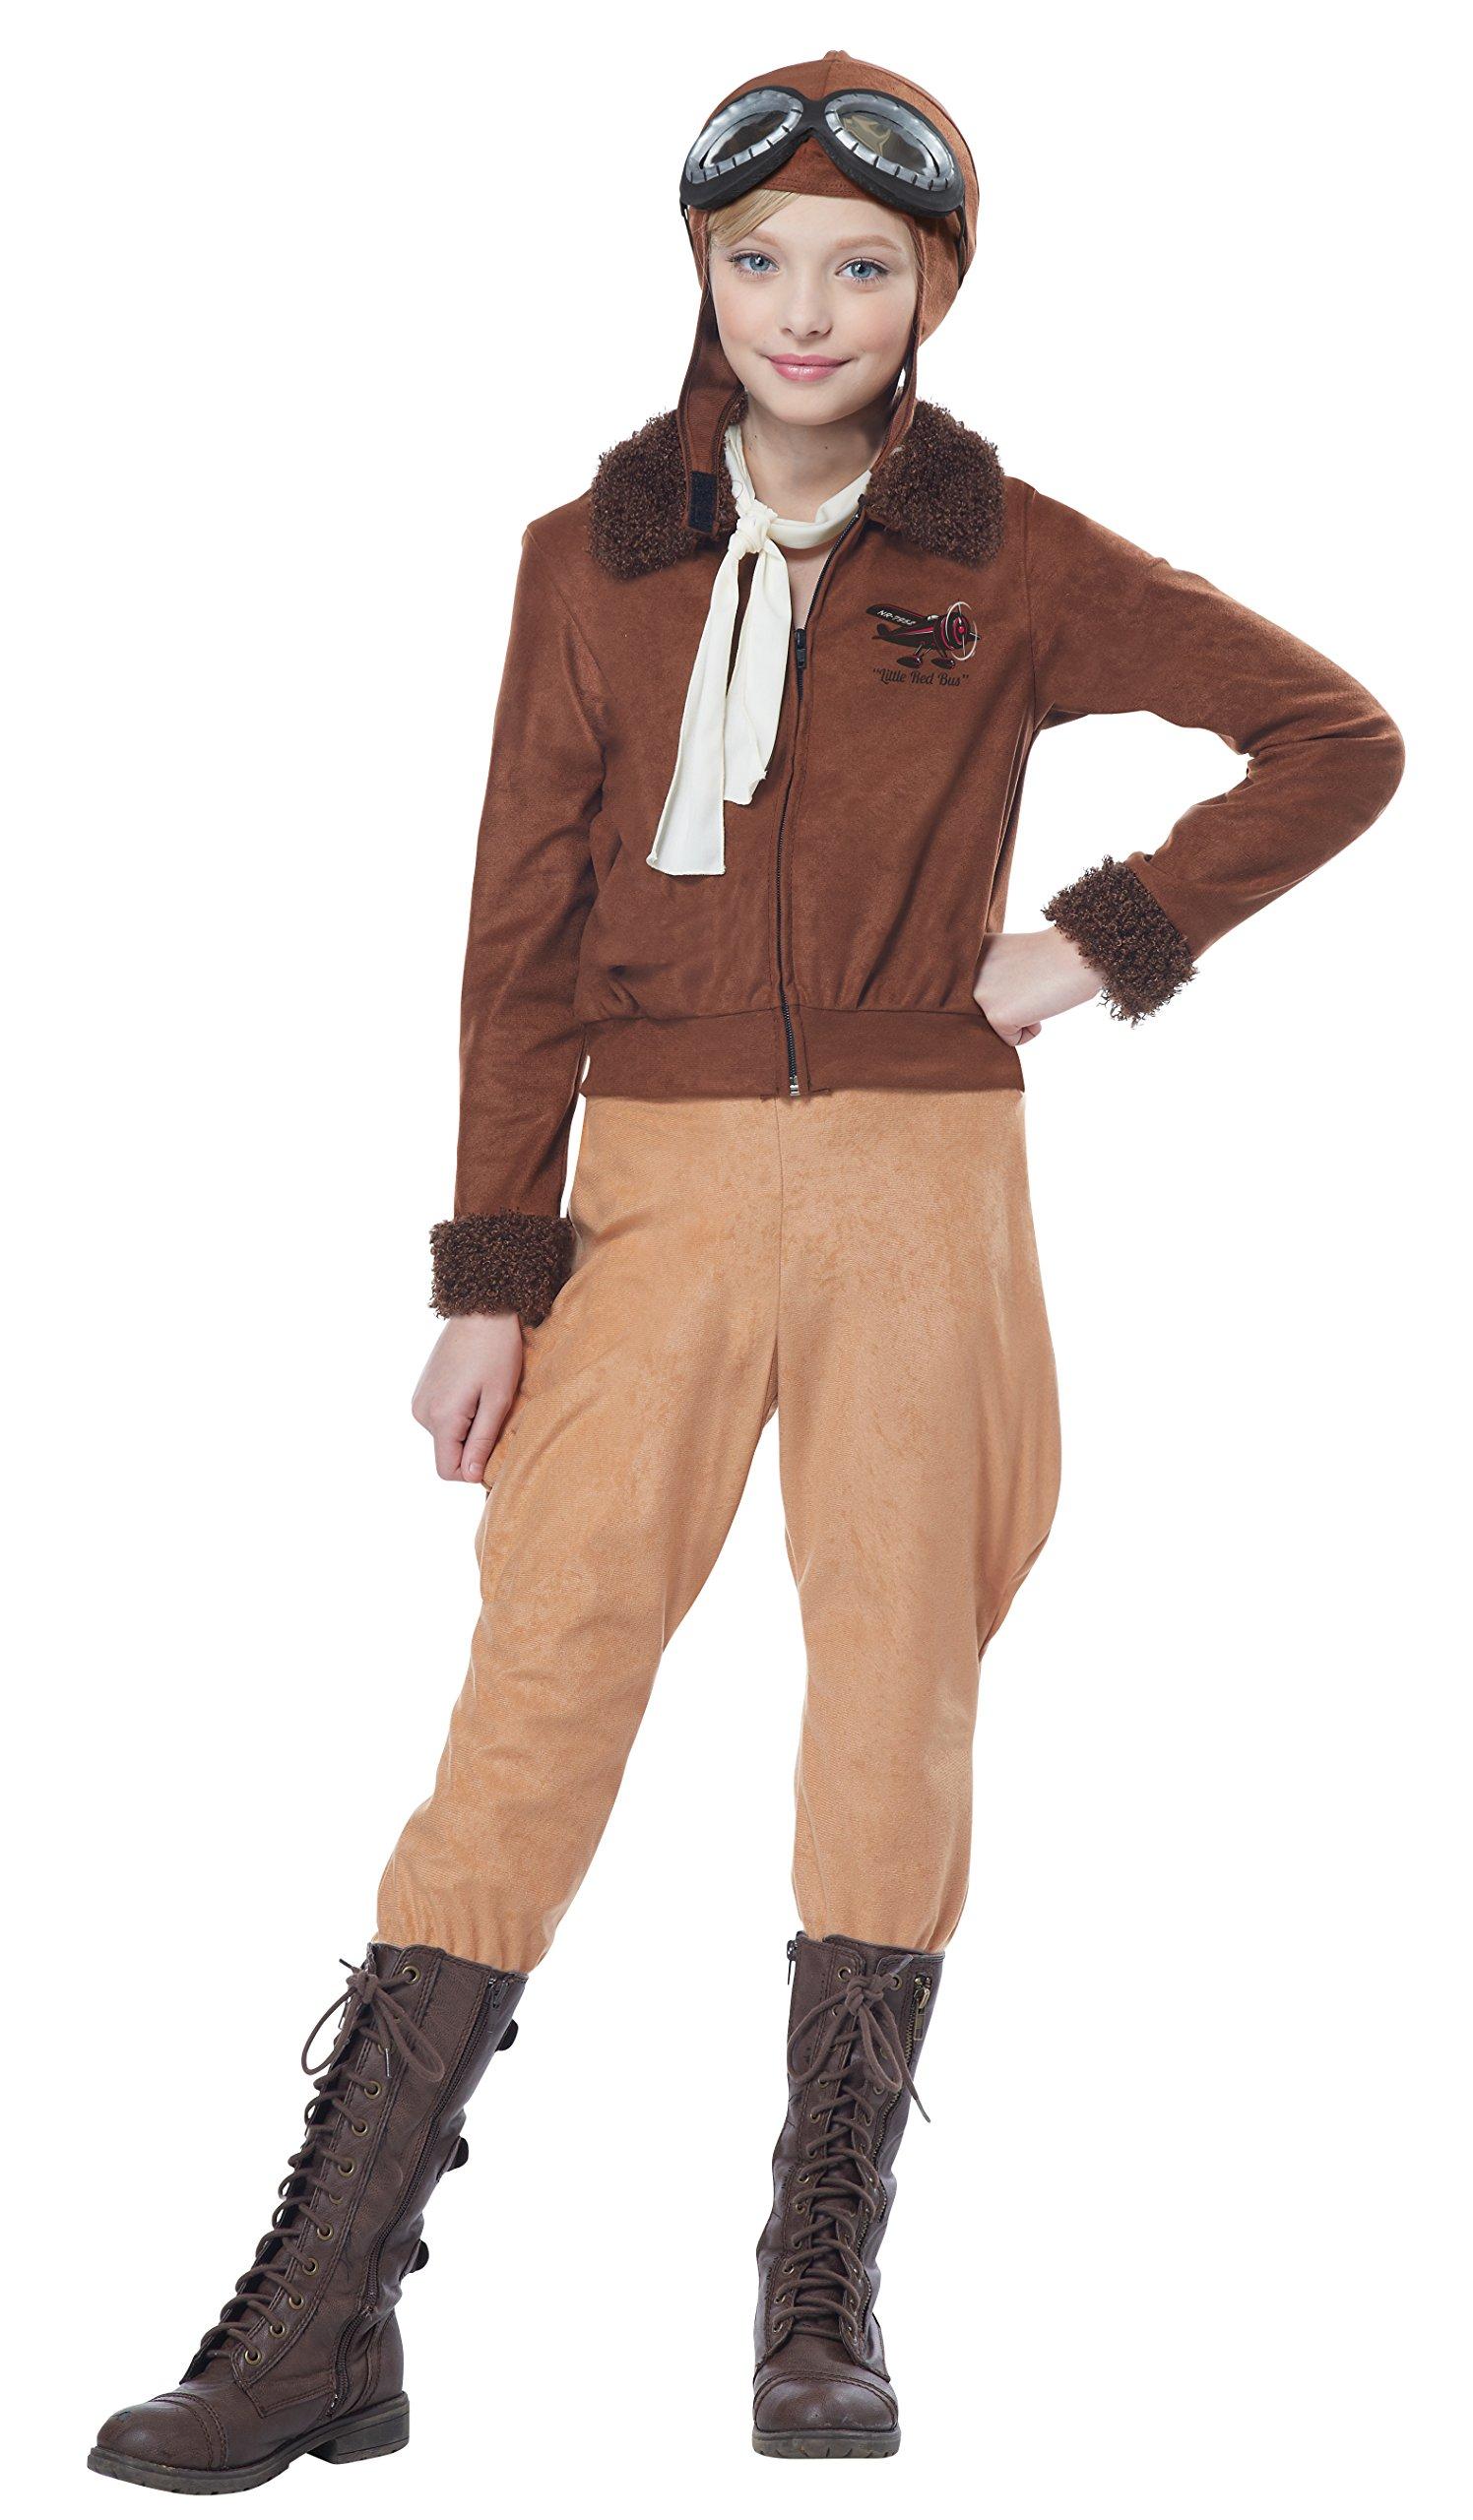 California Costumes Amelia Earhart/Aviator Costume, Medium, Brown